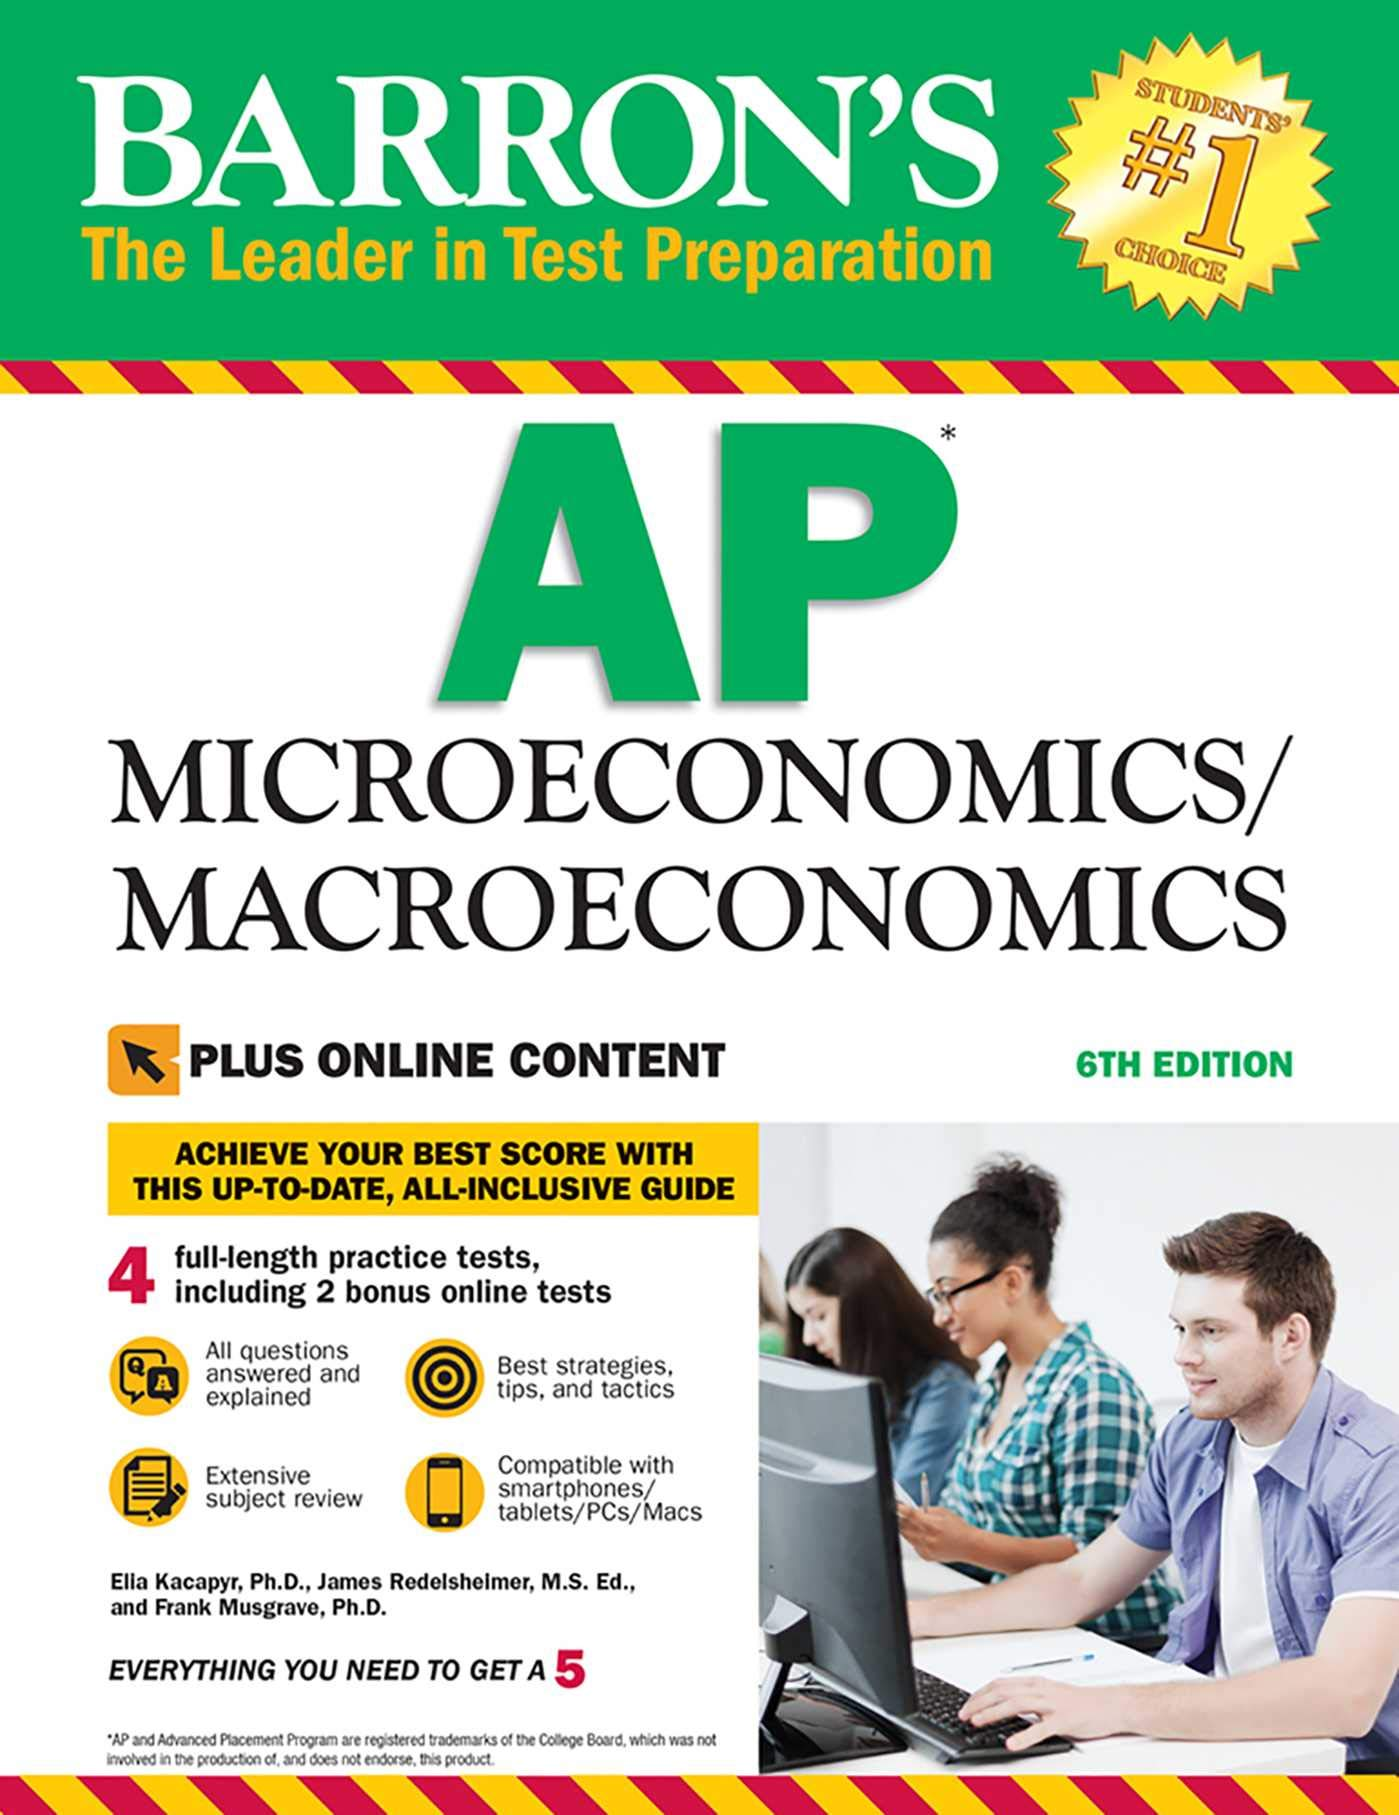 AP Microeconomics/Macroeconomics with Online Tests (Barron's Test Prep)